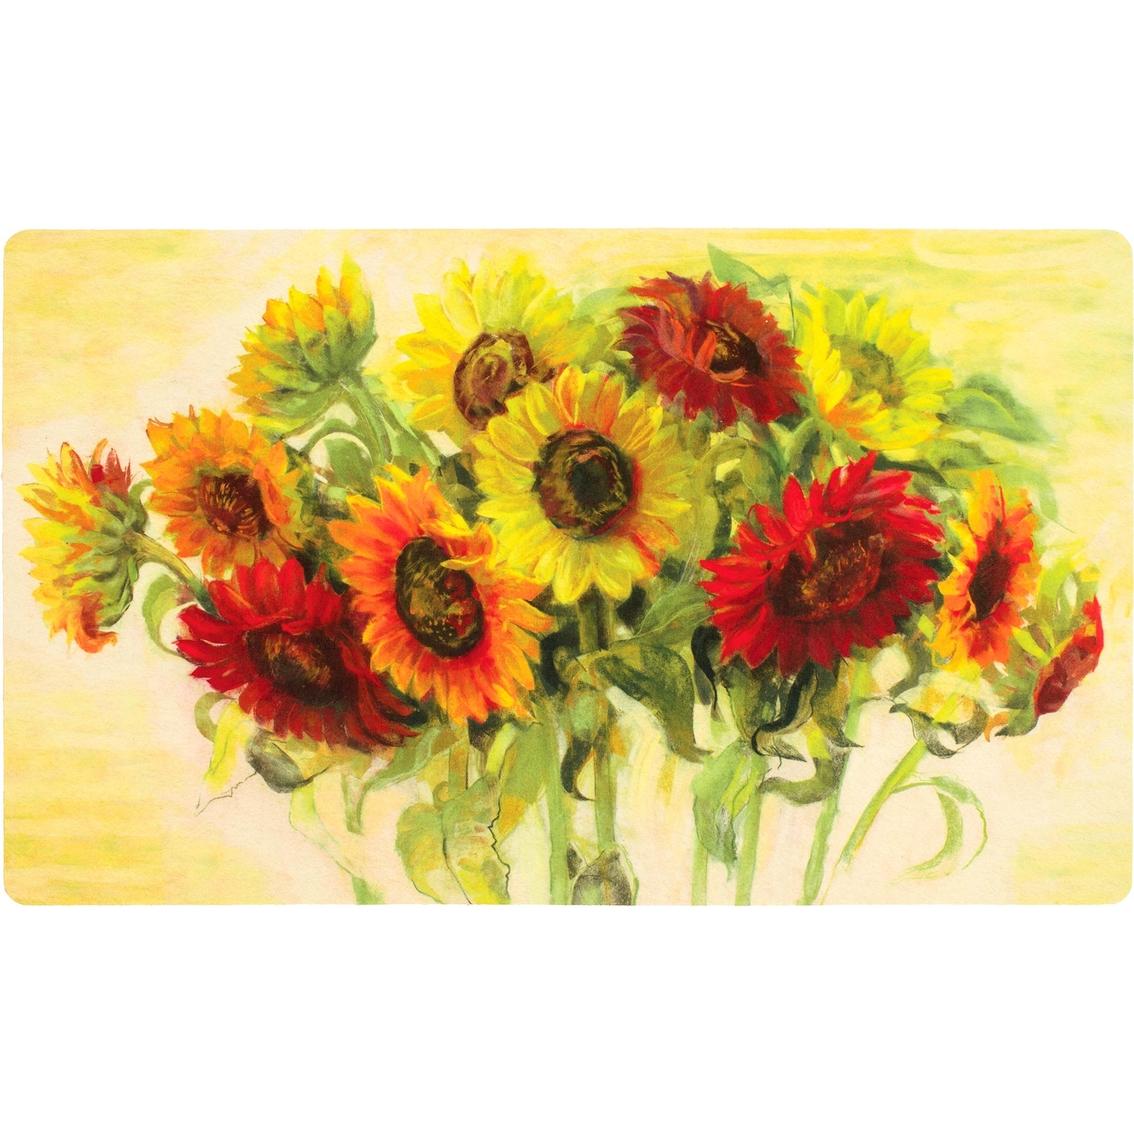 mohawk home gathering sunflowers kitchen mat 18x30 - Sunflower Kitchen